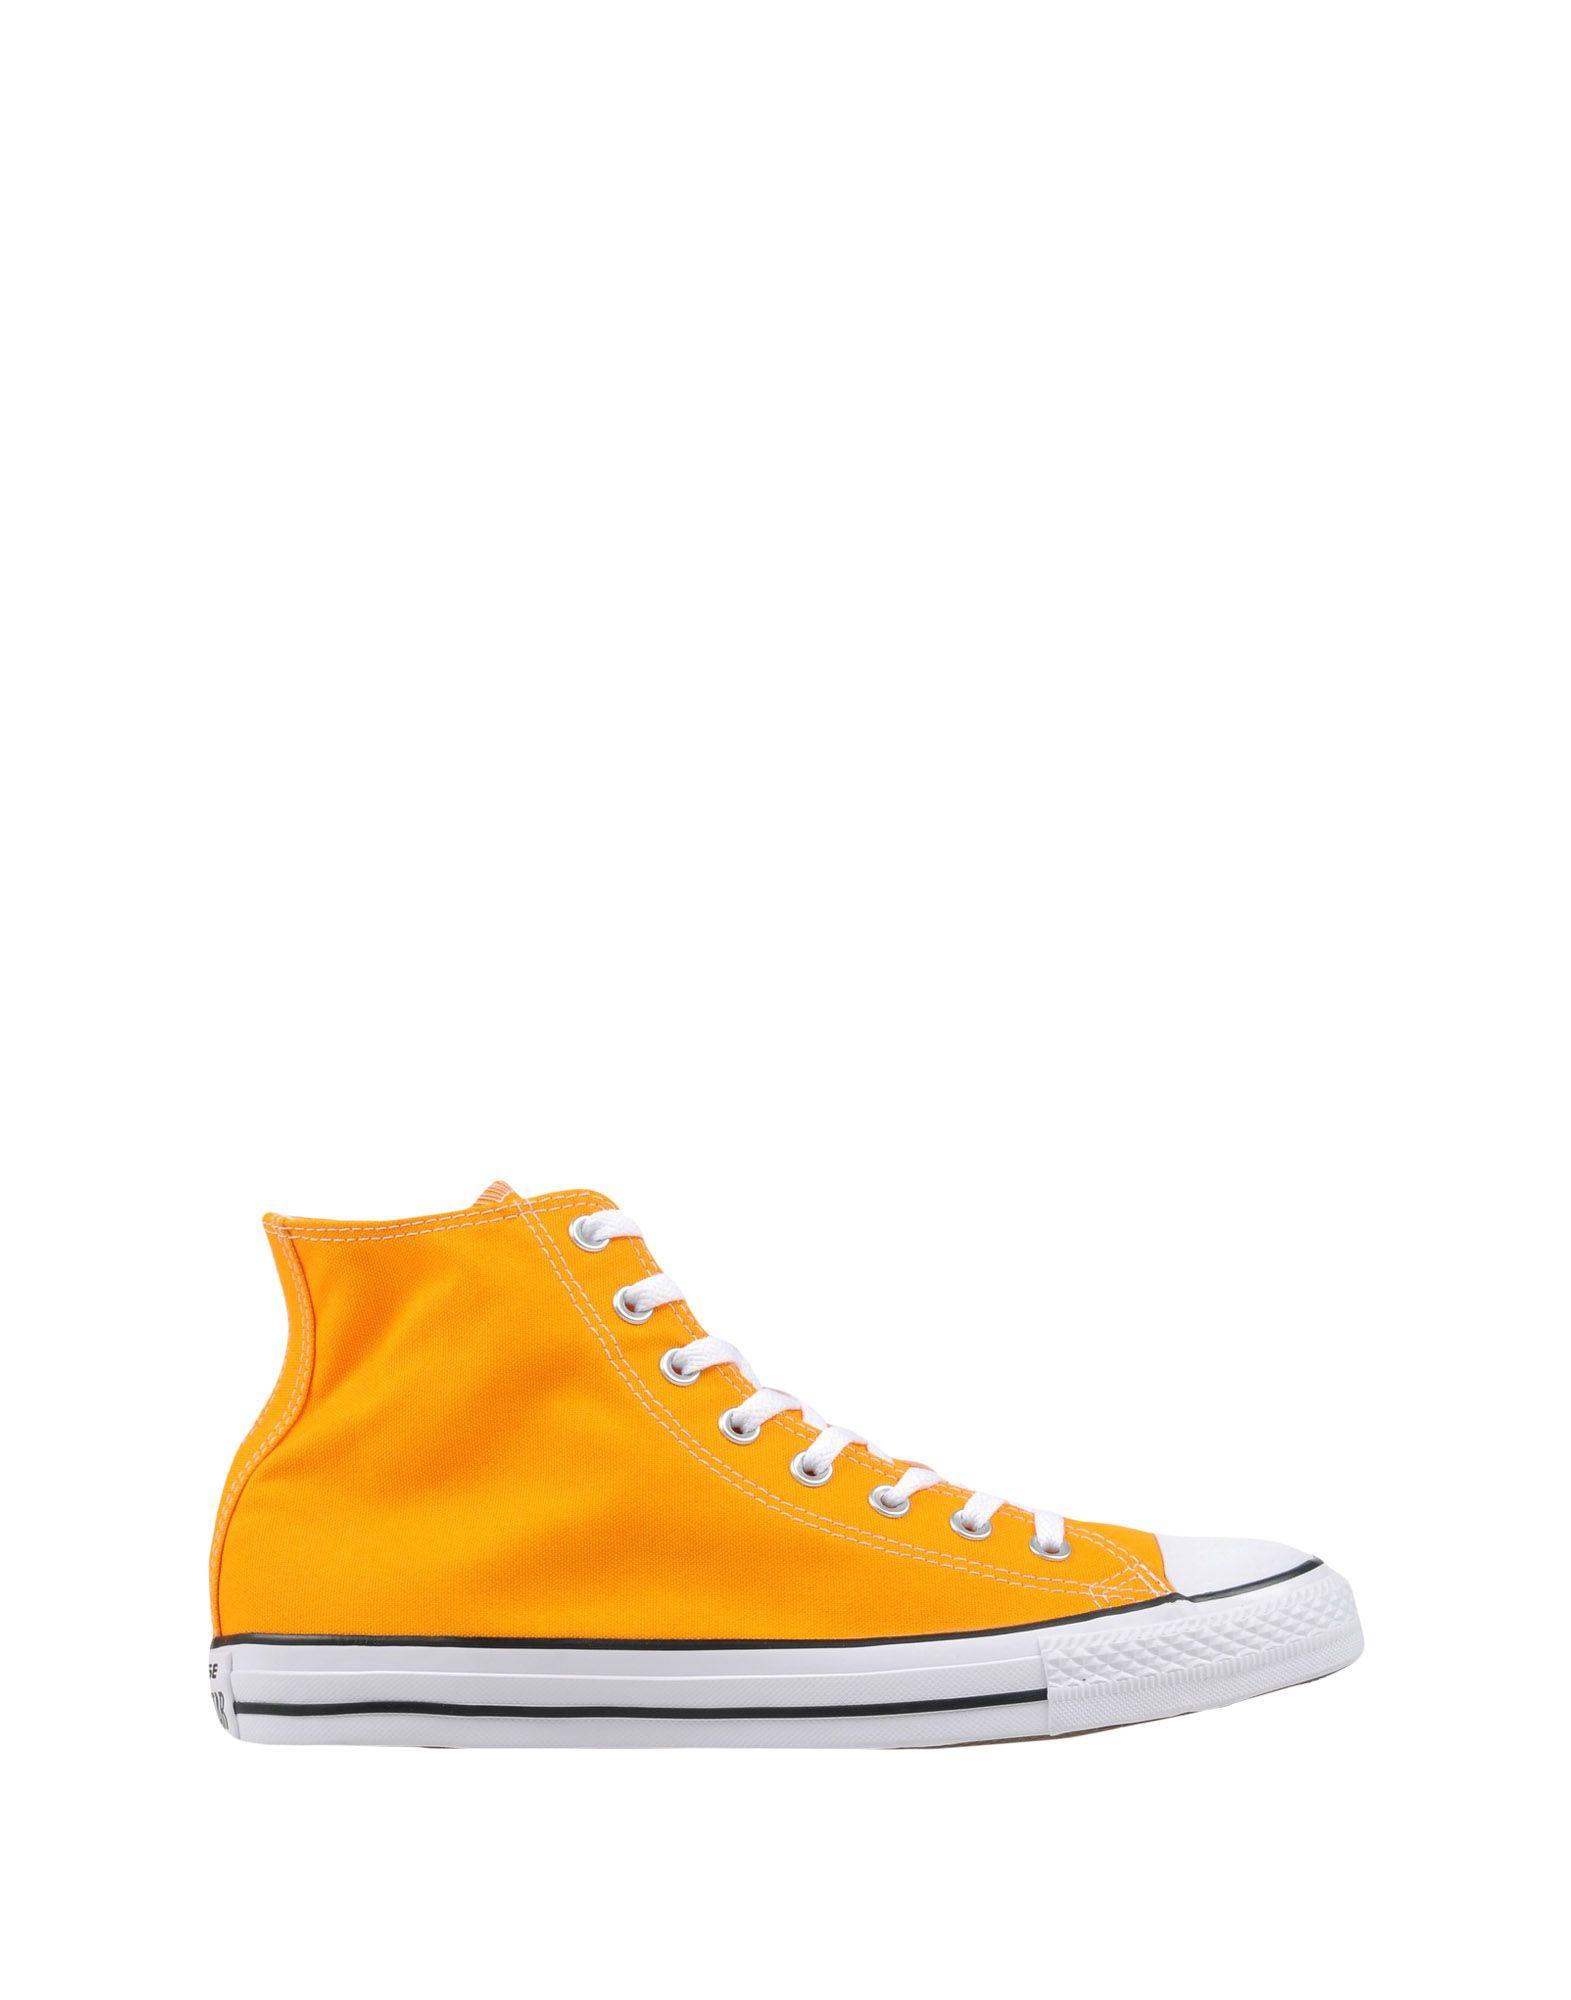 Sneakers Converse All Star Ctas Hi Canvas Seasonal Colors - Homme - Sneakers Converse All Star sur